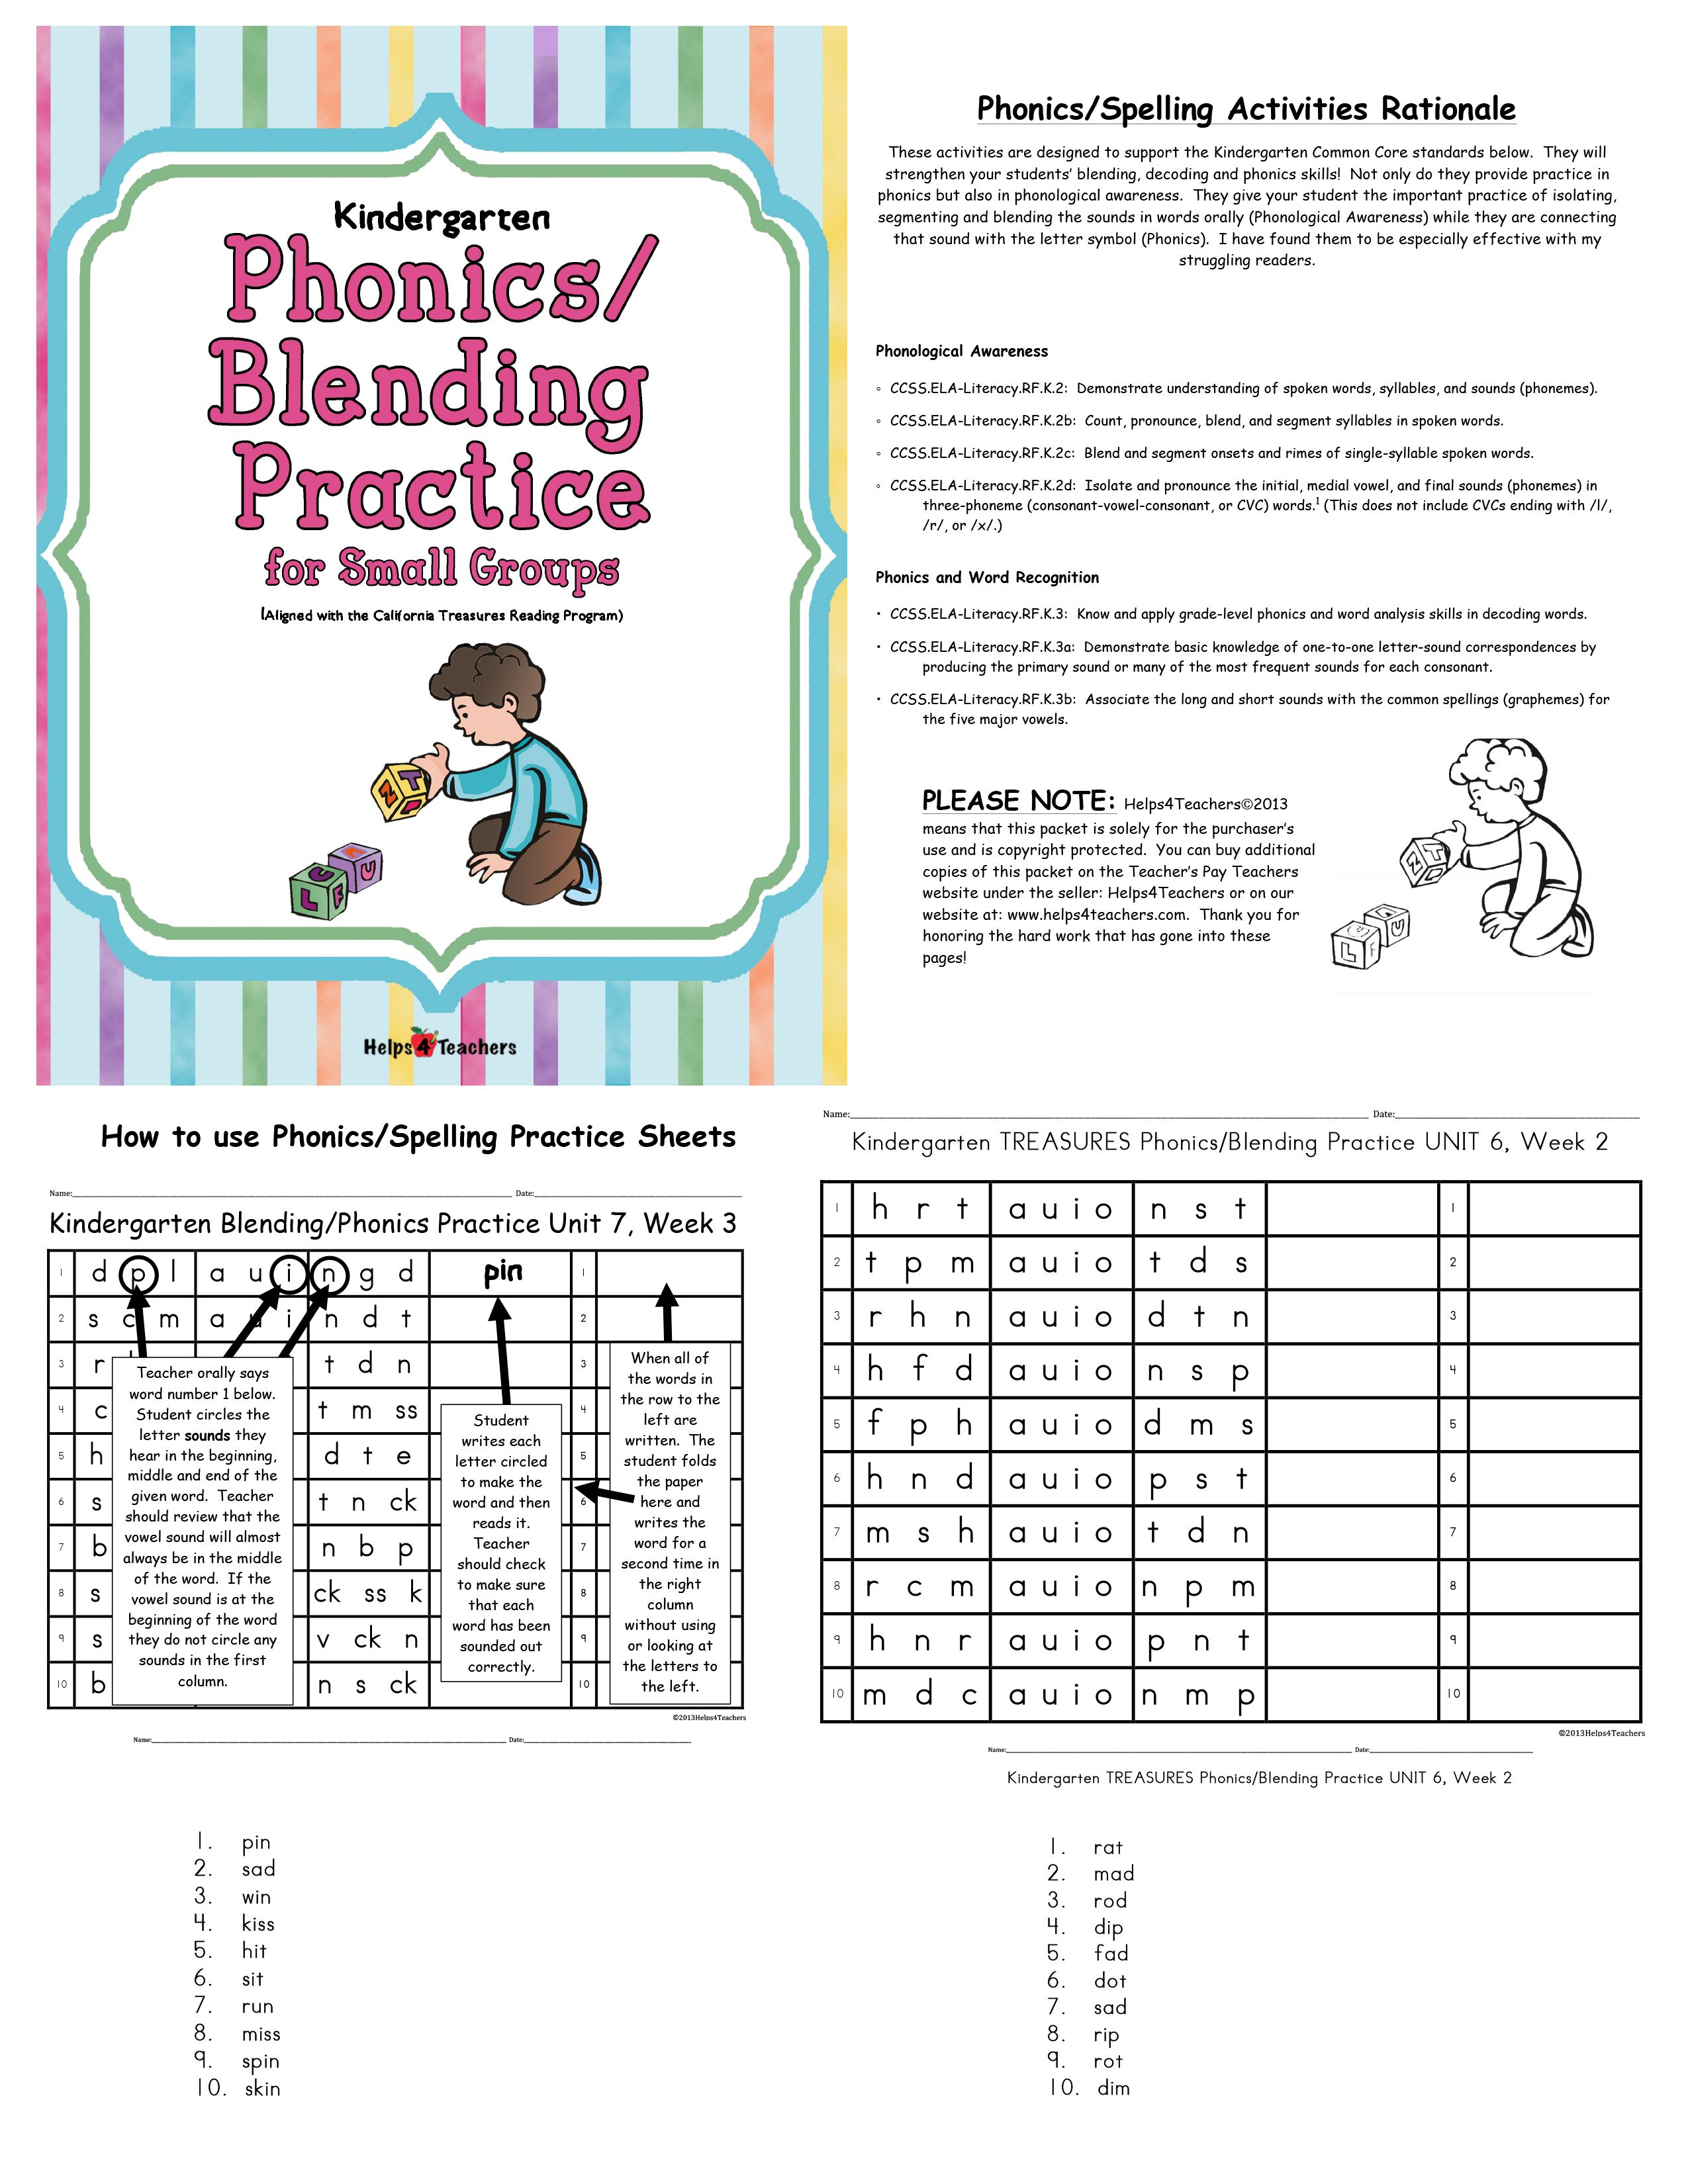 Phonics Blending Practice Includes One Blending